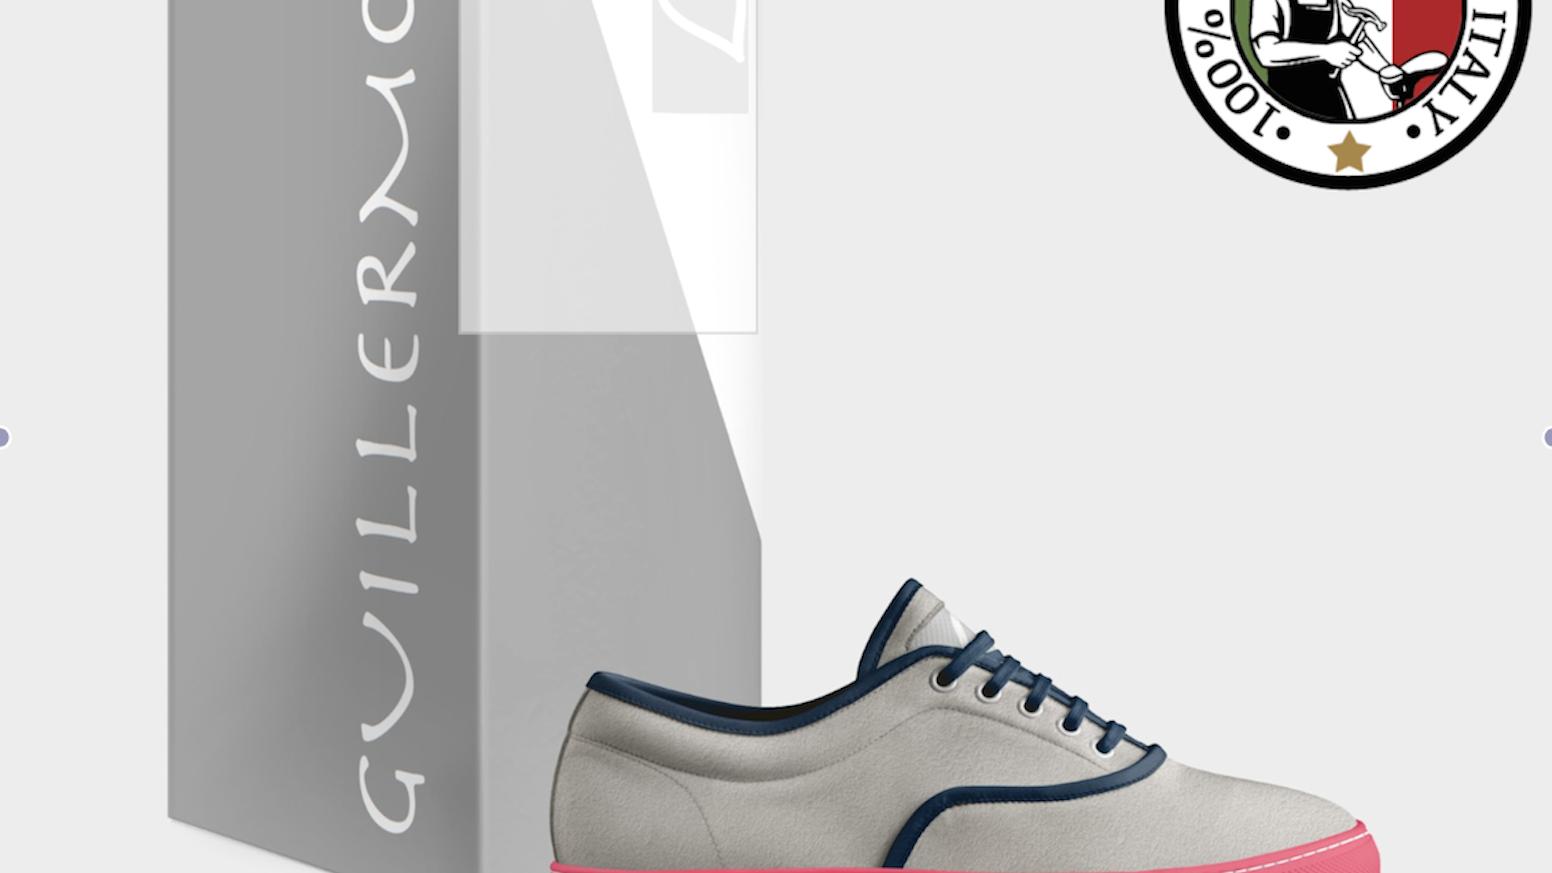 928e80537fc9 Handmade Fashionable Italian Shoes - Establishing GUILLERMO by ...